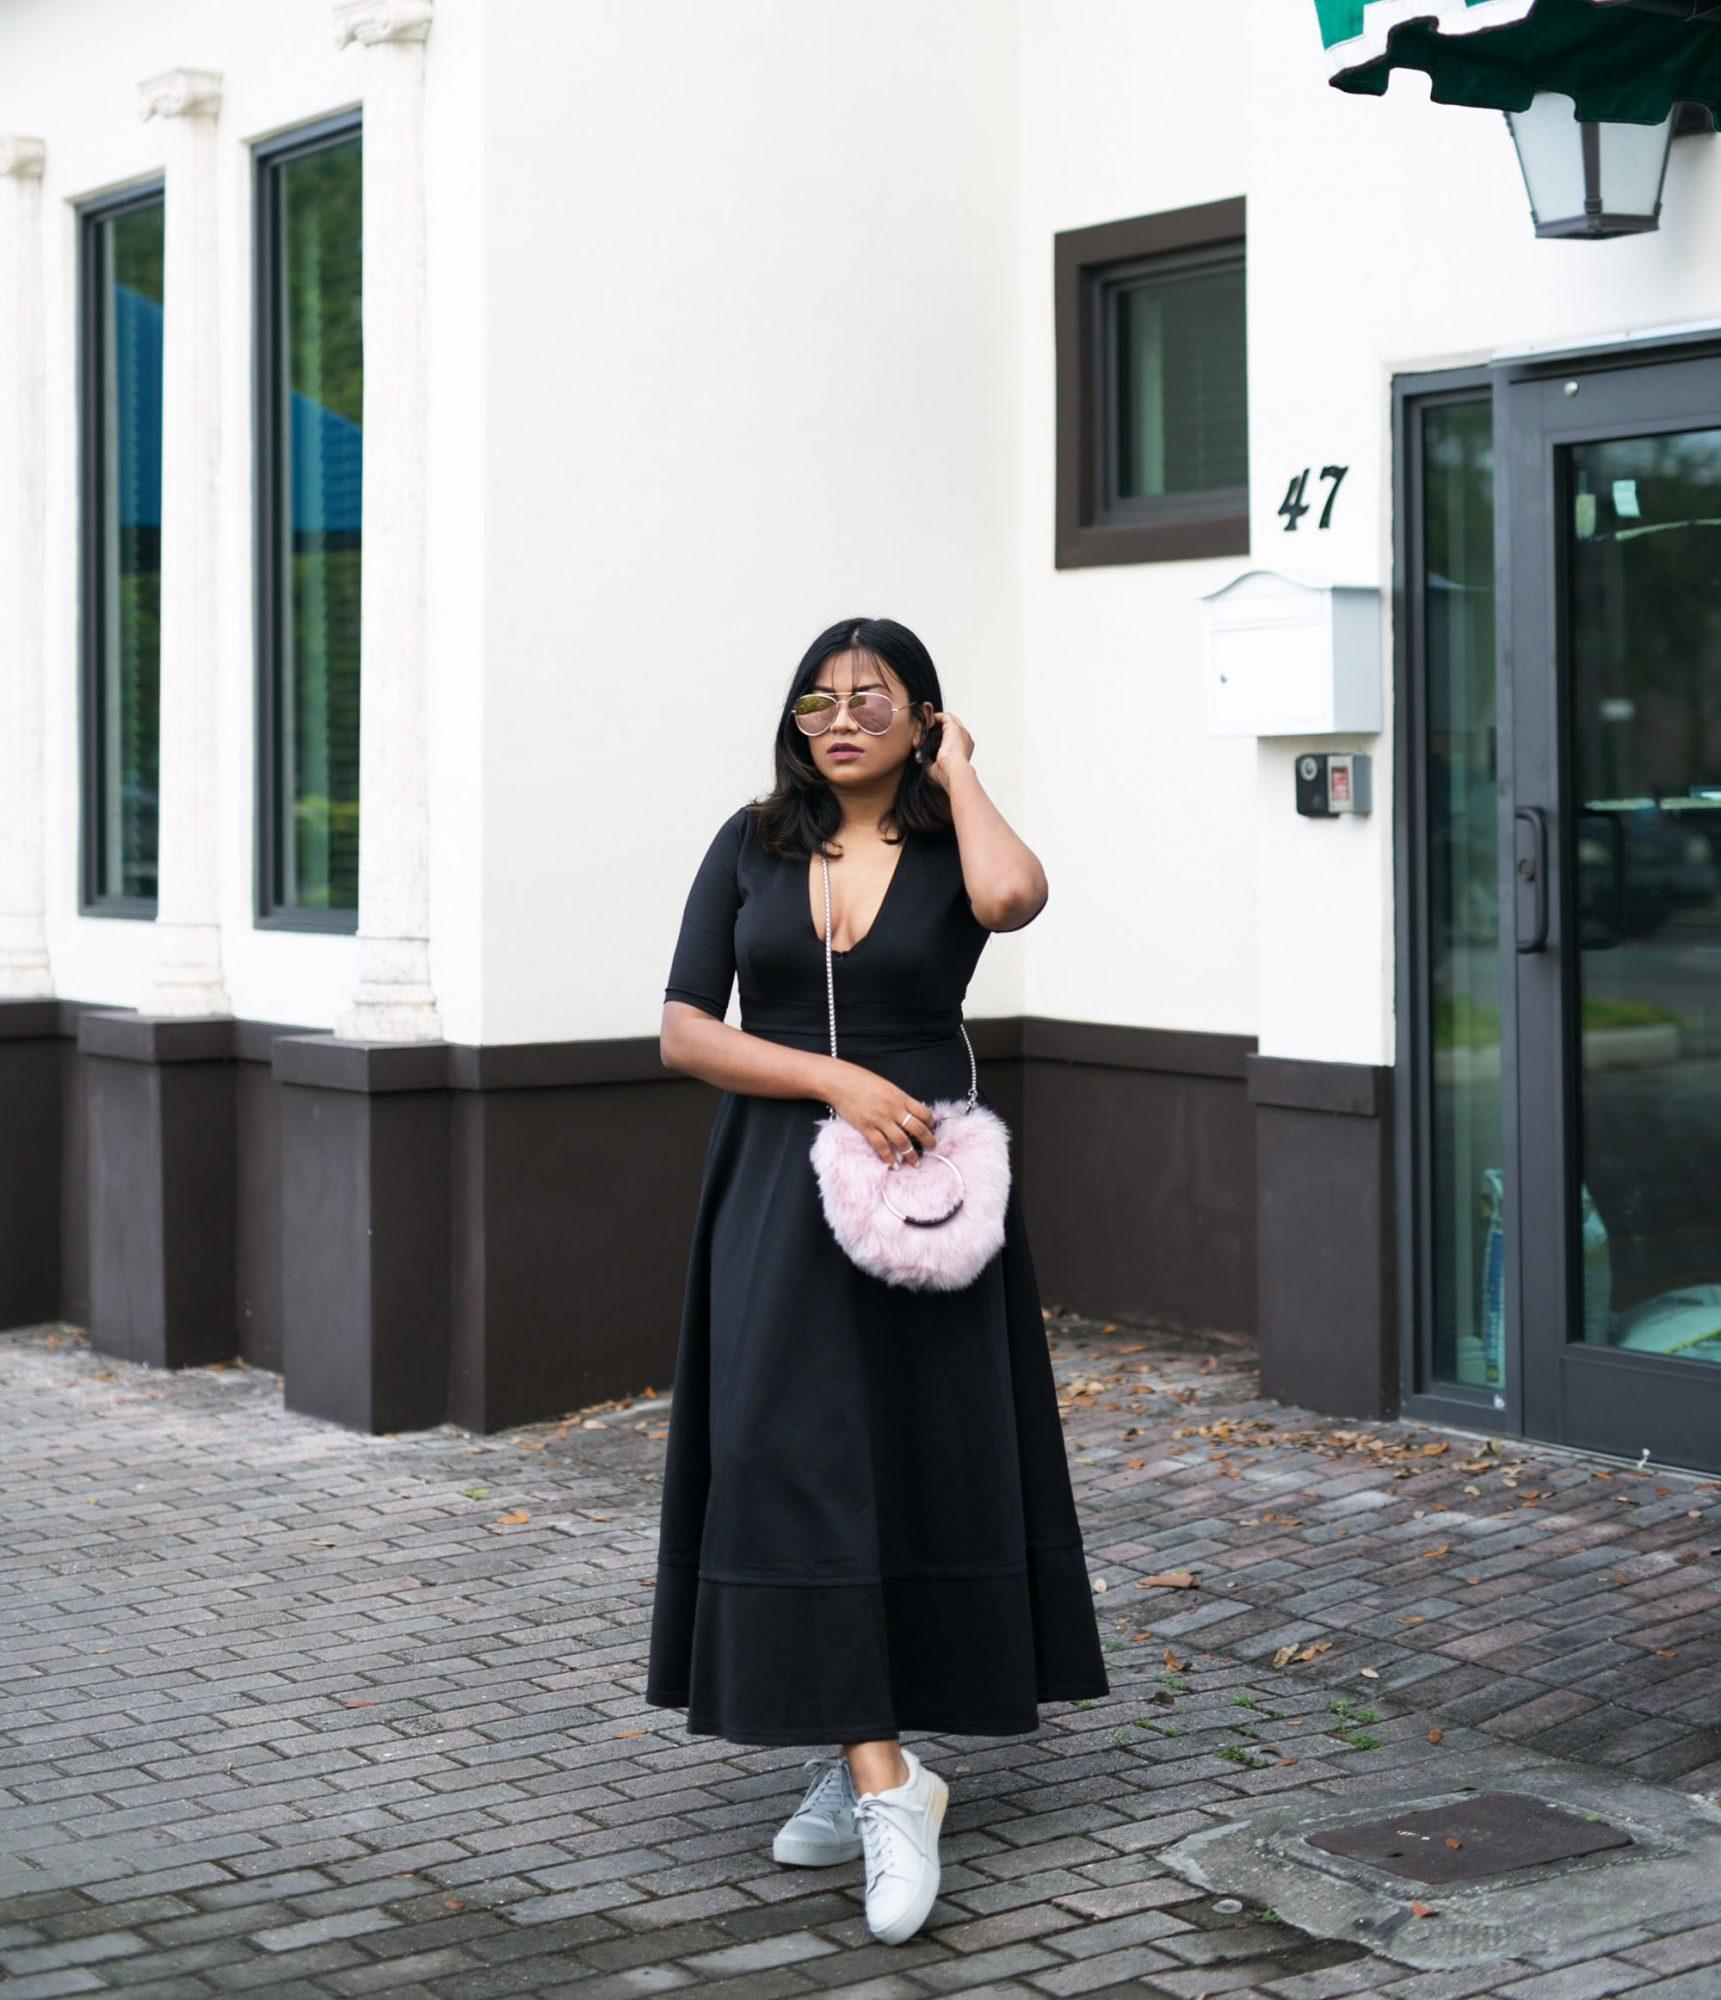 Miami Fashion Influencer Lifestyle Chic Stylista